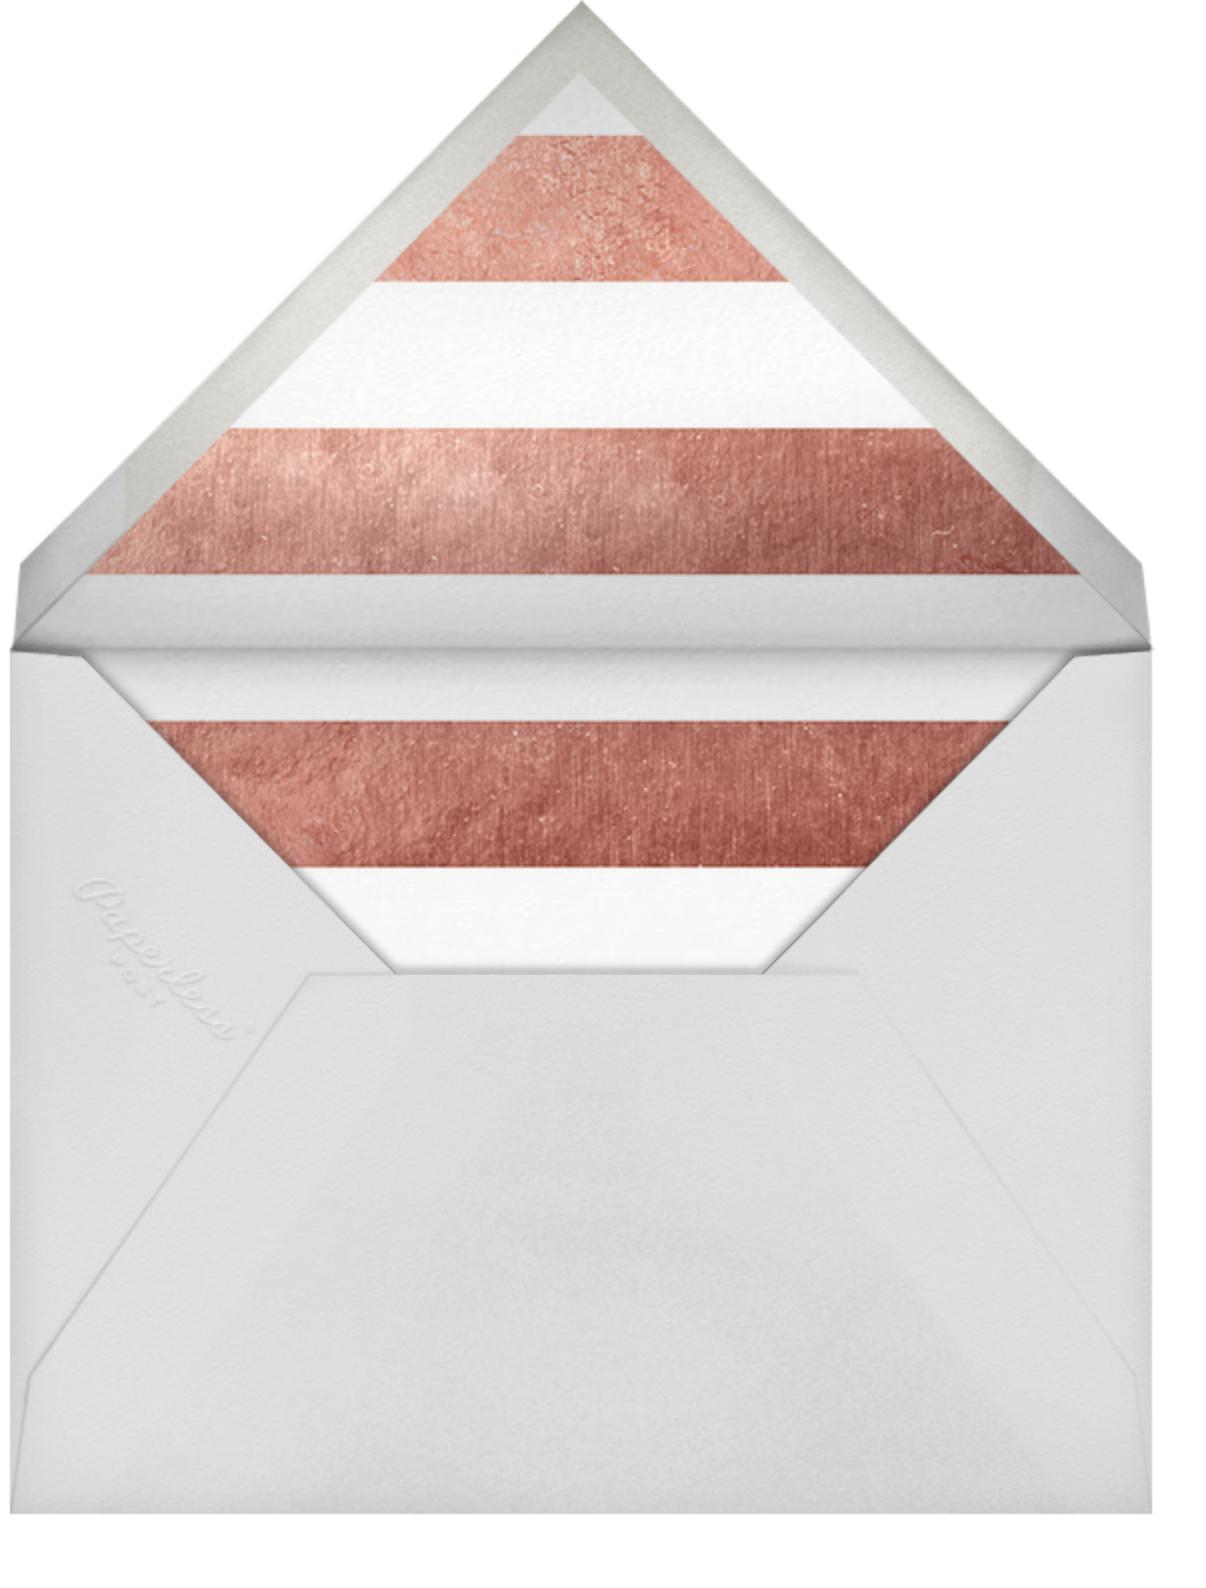 Luminous Heart - White/Rose Gold - Sugar Paper - Engagement party - envelope back